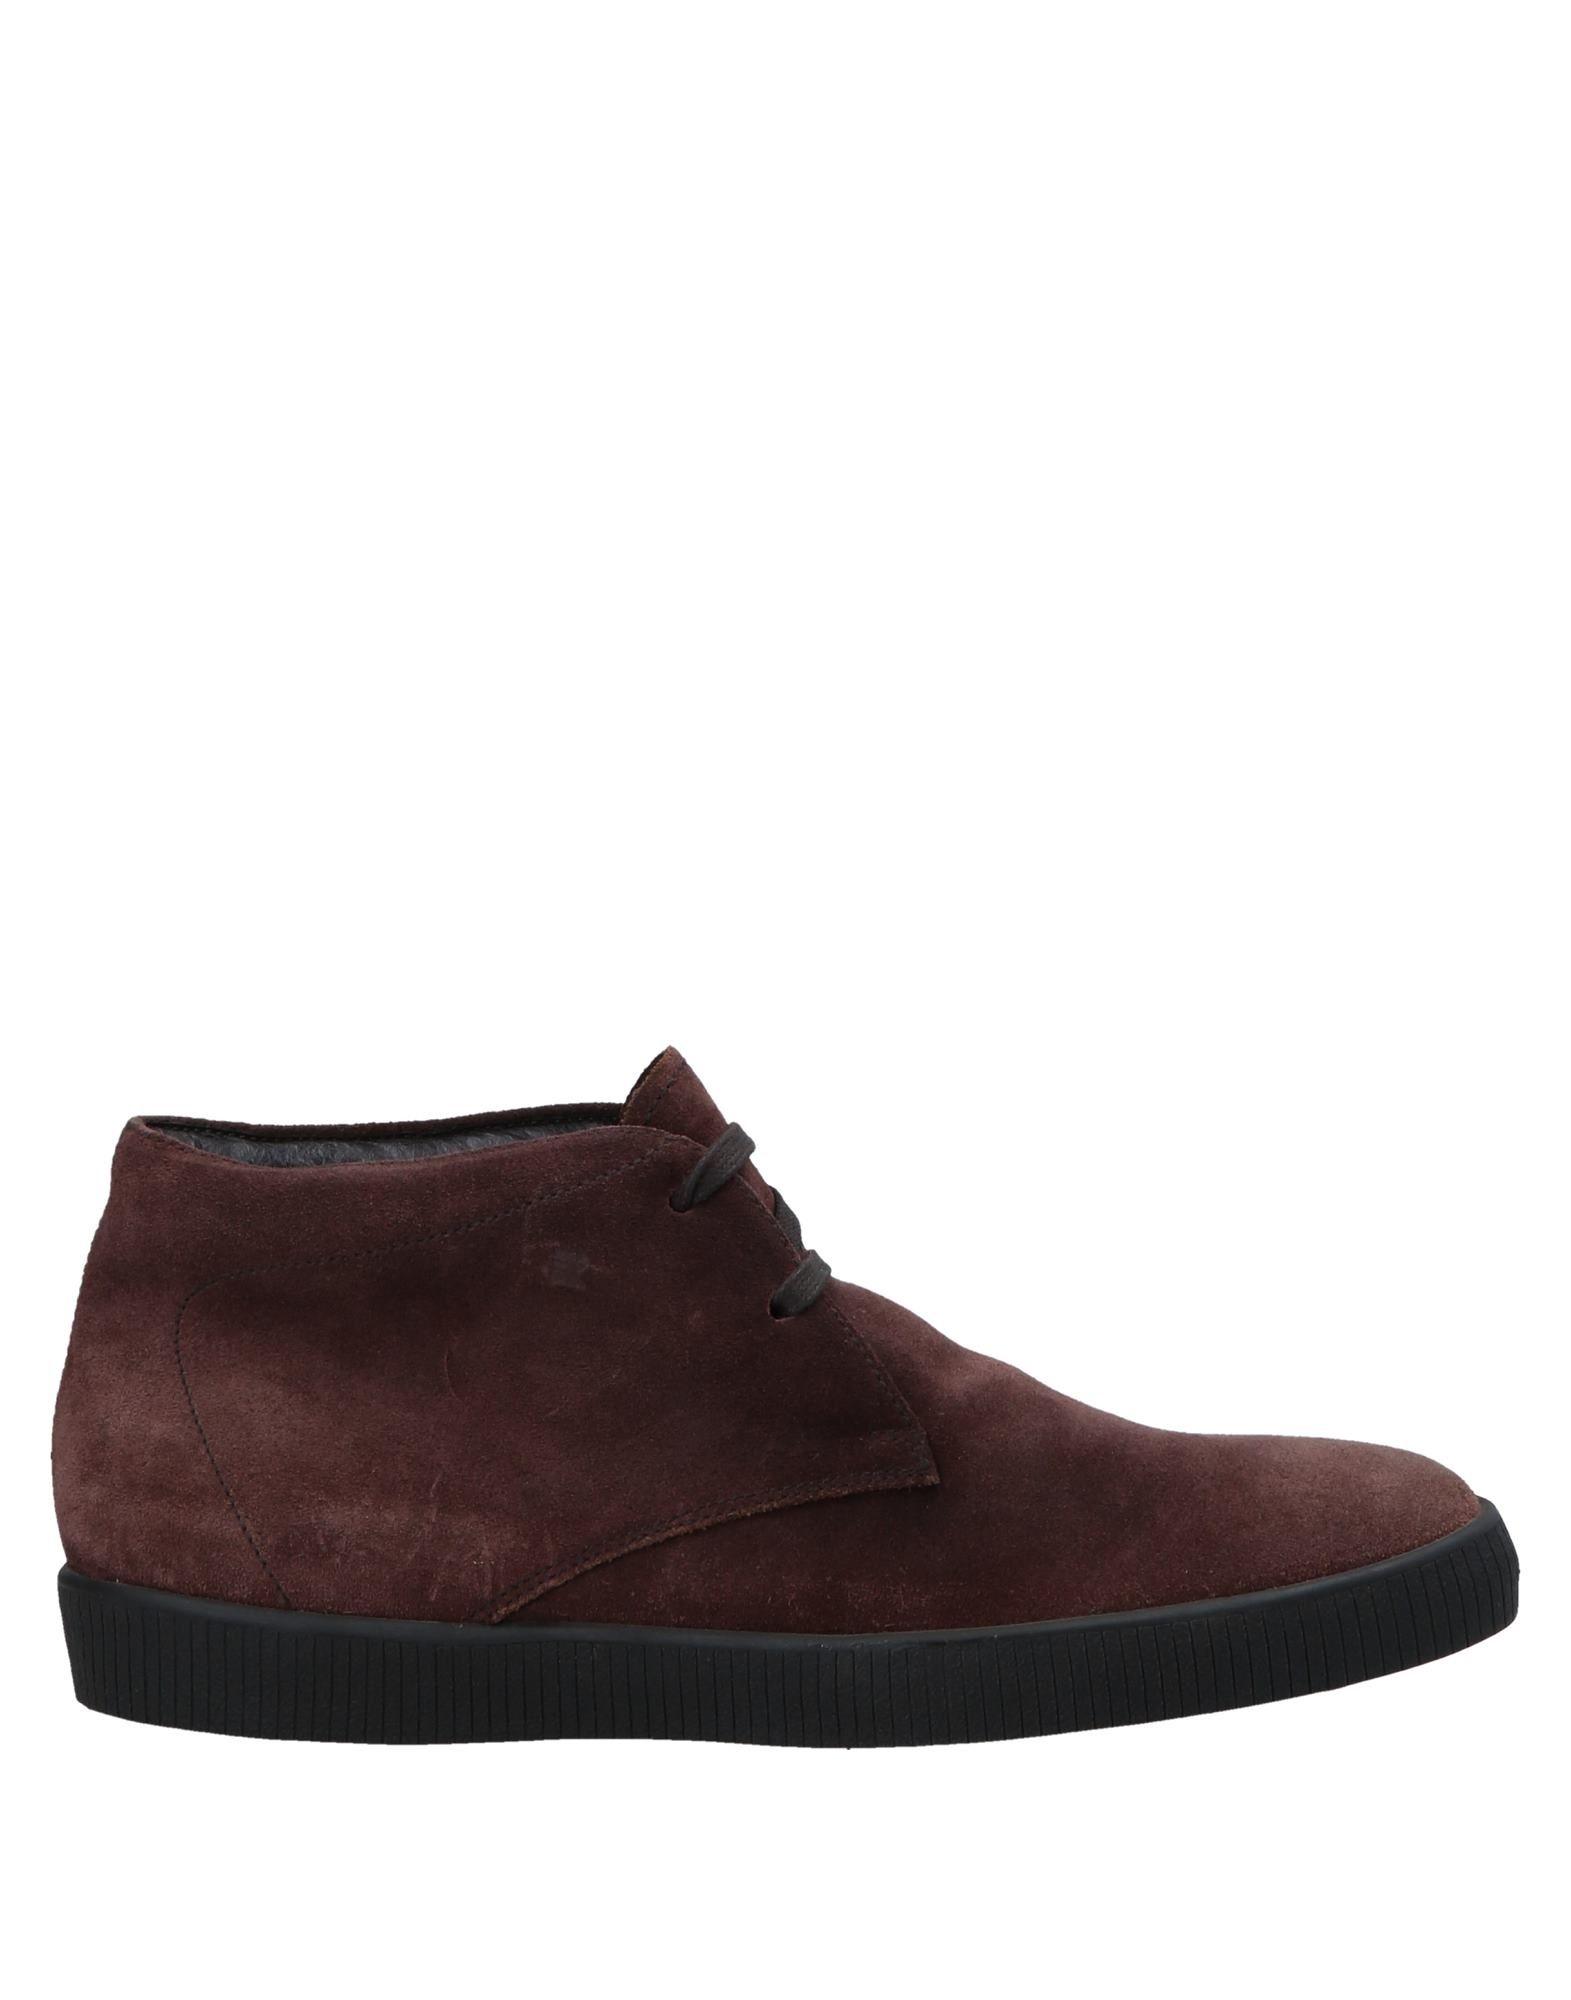 Fratelli Rossetti Rossetti Boots - Men Fratelli Rossetti Rossetti Boots online on  Australia - 11550227LF 15ca68